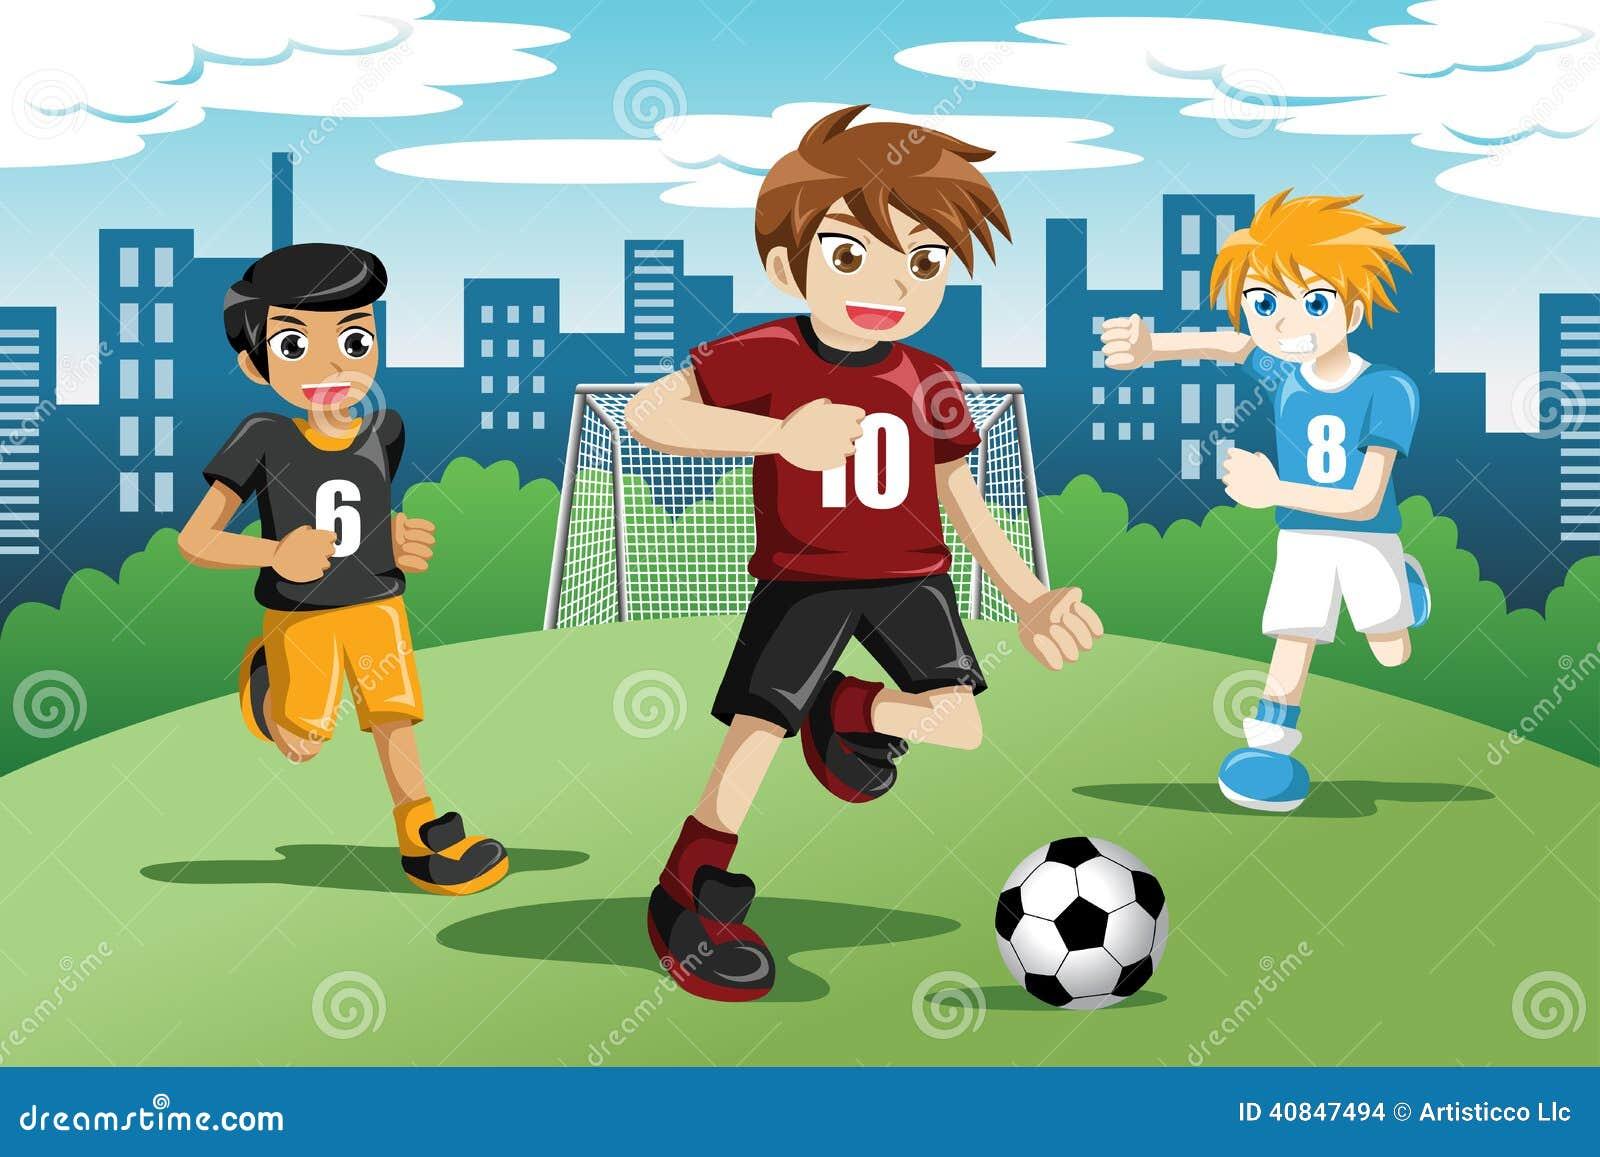 explain how to play football